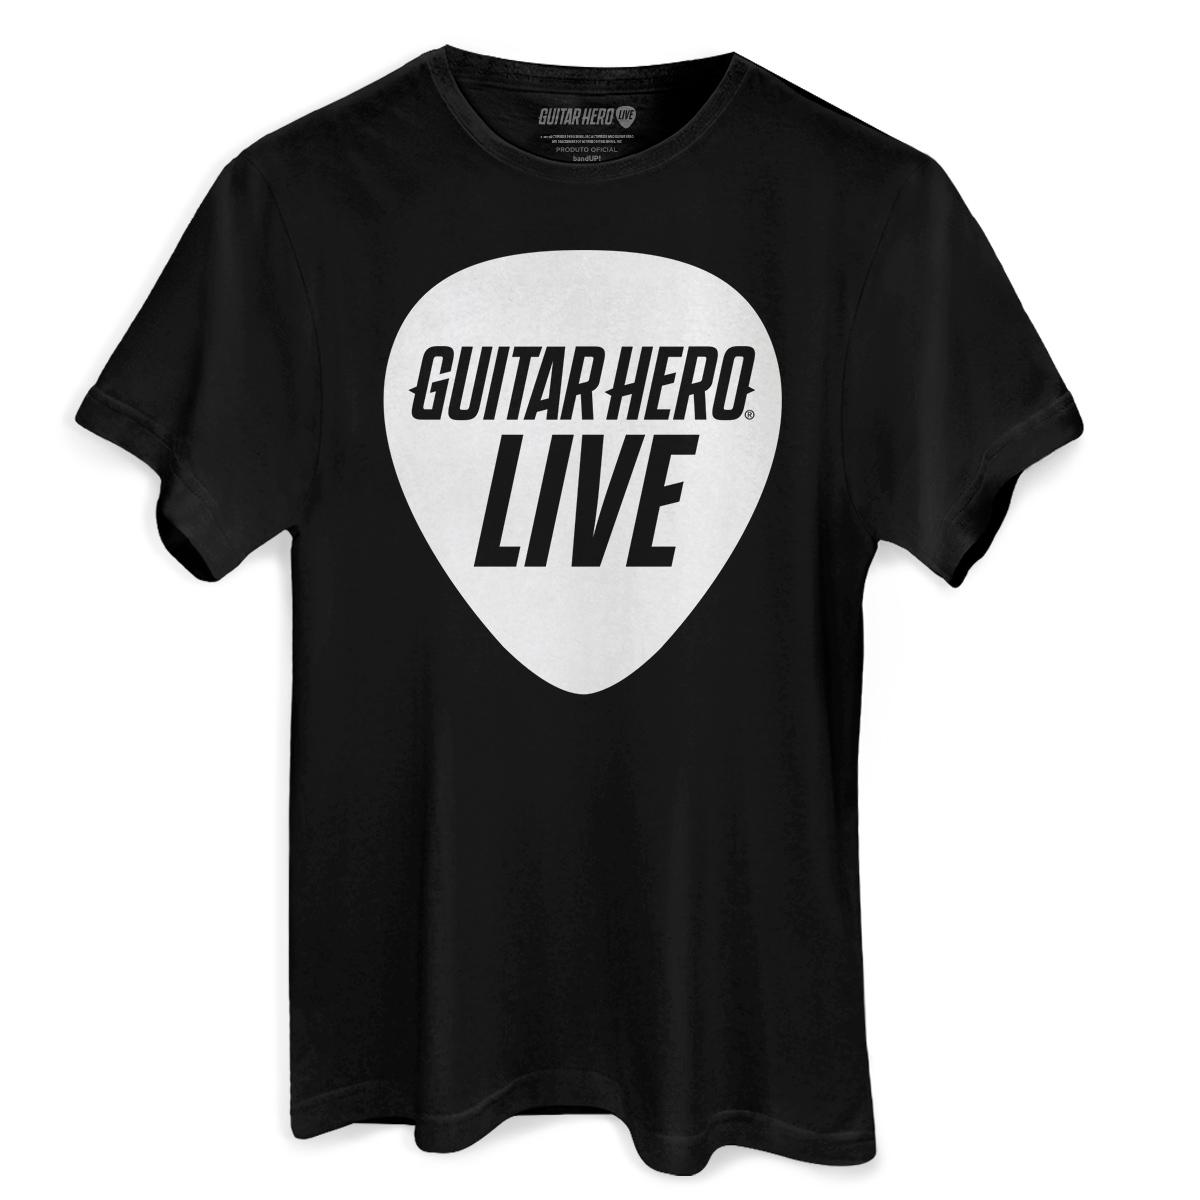 Camiseta Masculina Guitar Hero Palheta